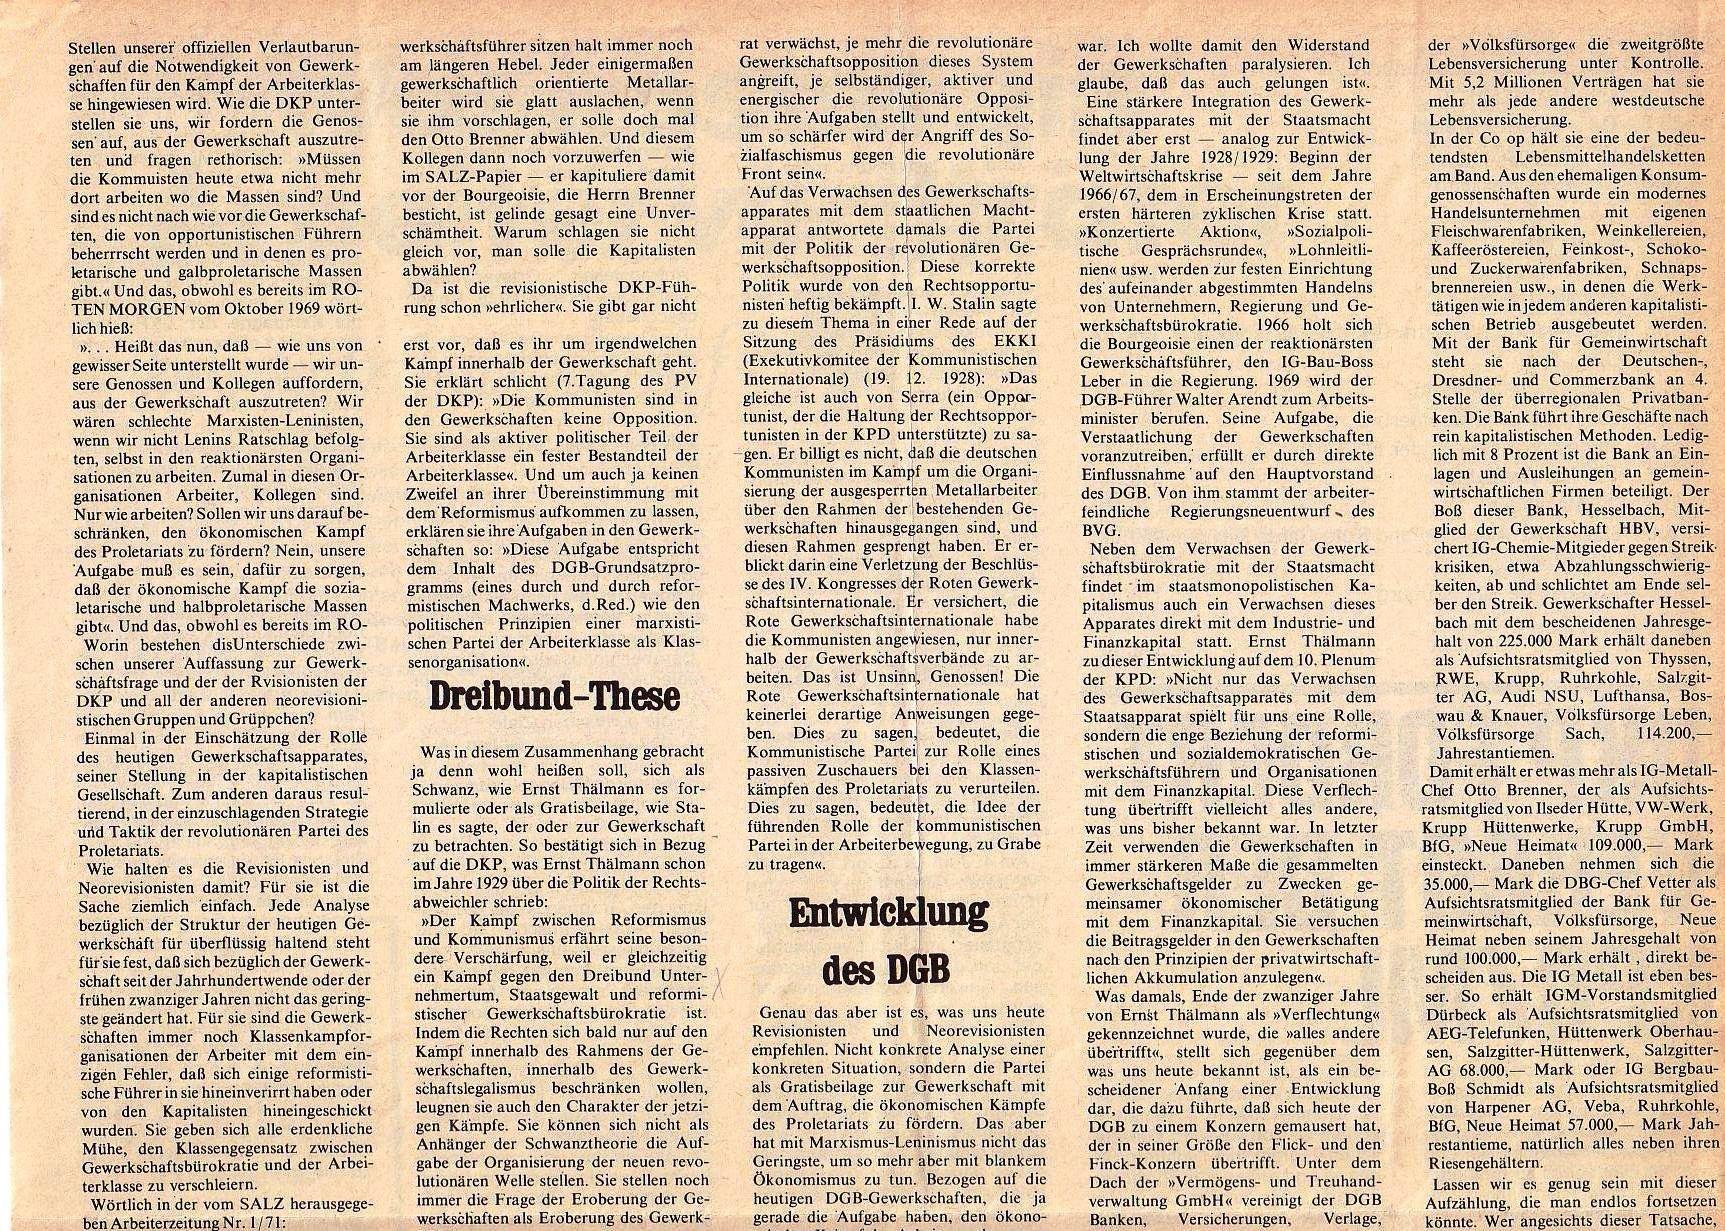 Roter Morgen, 5. Jg., Juli 1971, Nr. 7, Seite 5a